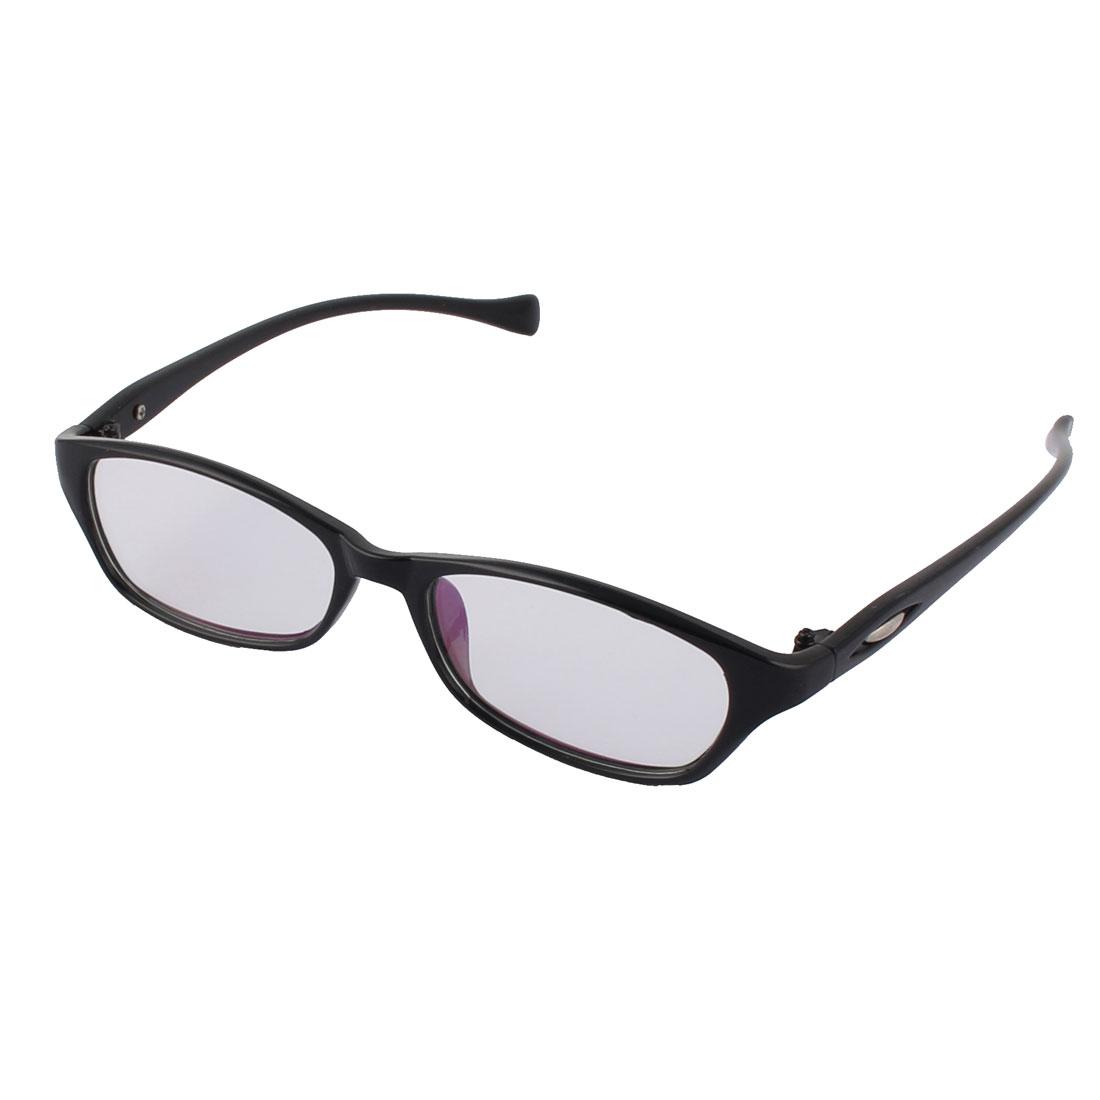 Stylish Clear Lens Light Black Full Frame Plastic Eyewear Optical Glass